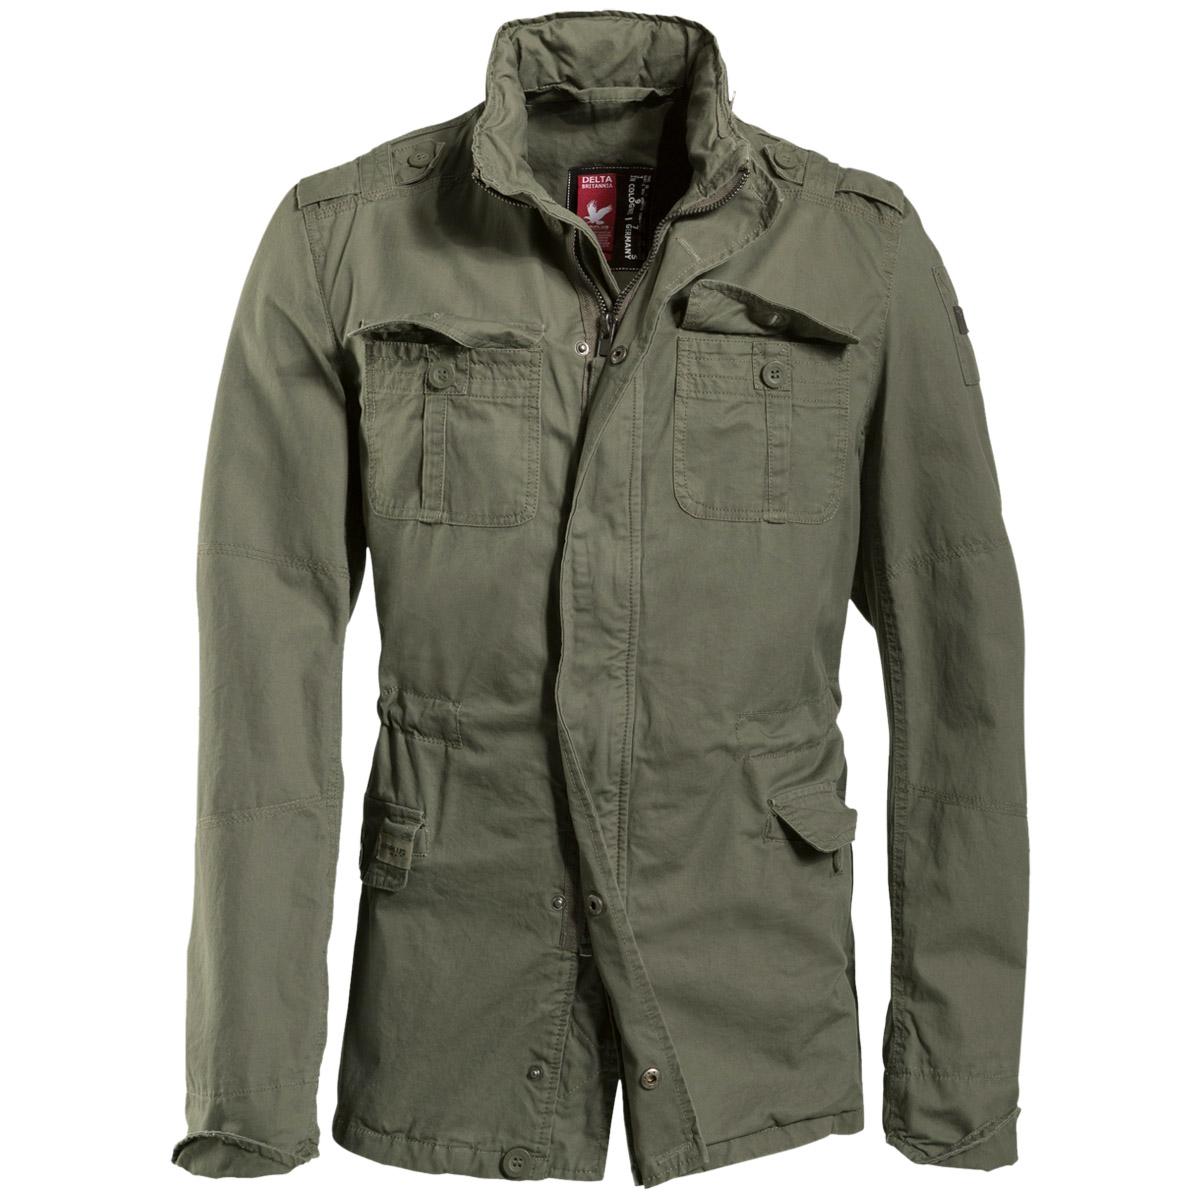 surplus delta britannia jacket military coat army combat mens parka olive washed ebay. Black Bedroom Furniture Sets. Home Design Ideas